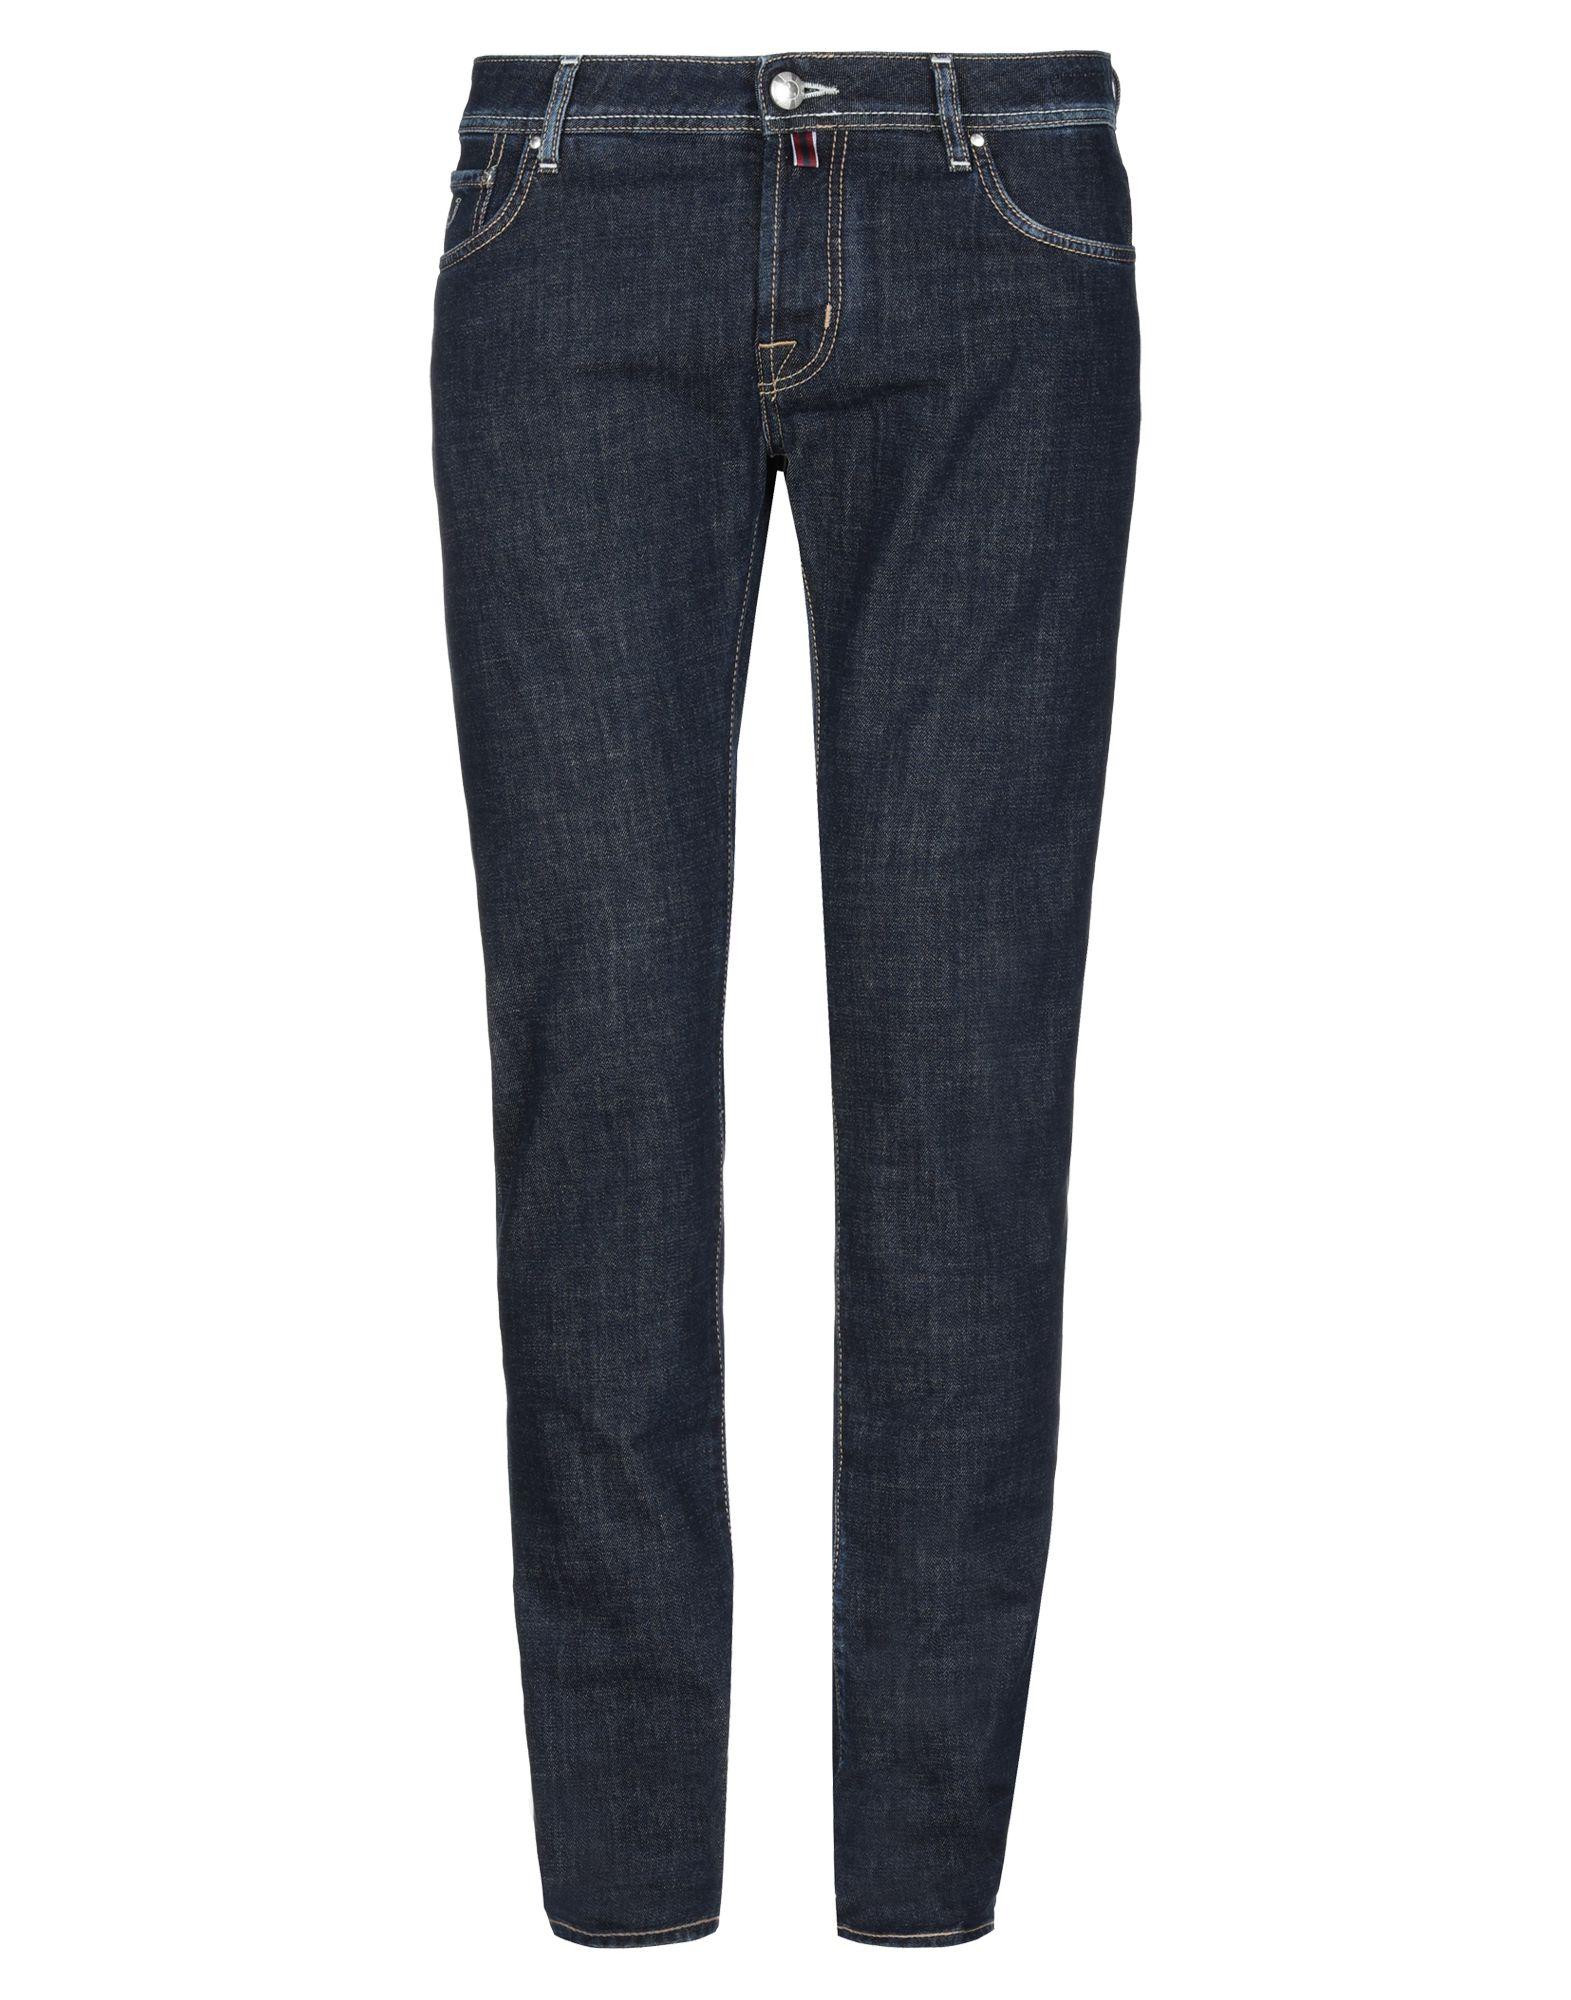 JACOB COHЁN Denim pants - Item 42766404